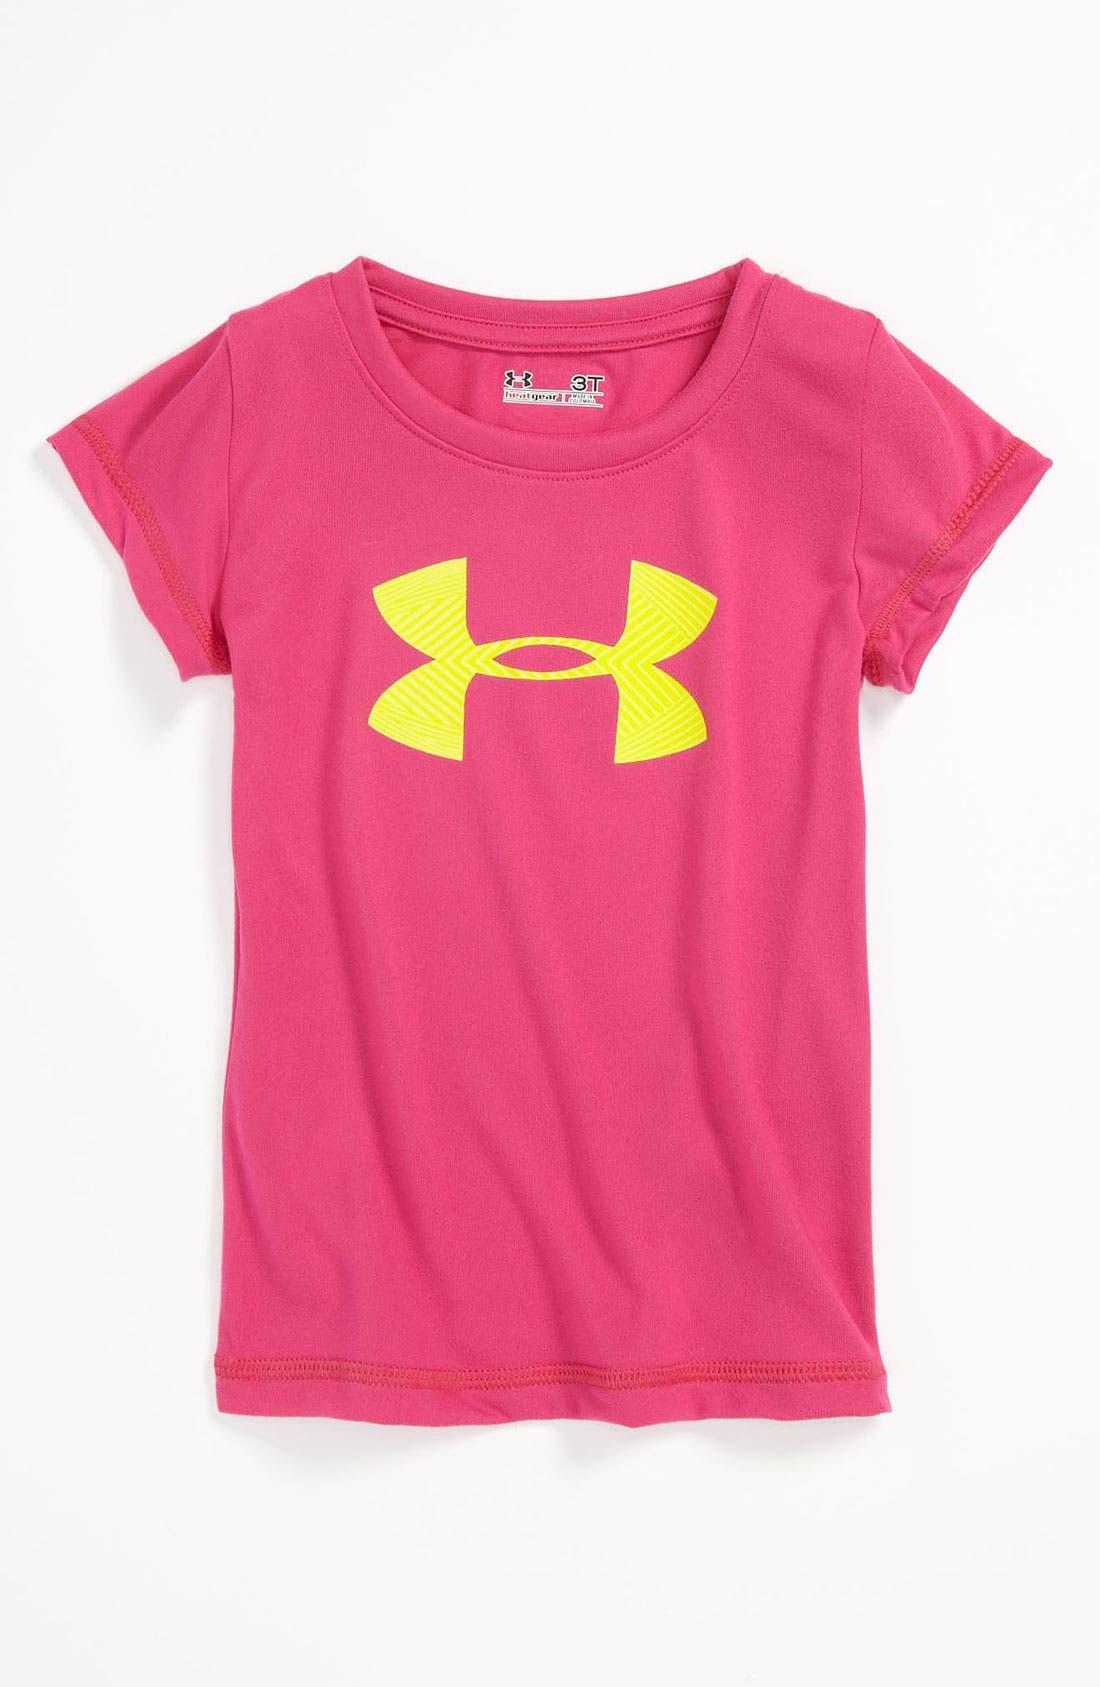 Main Image - Under Armour Logo Tee (Toddler)